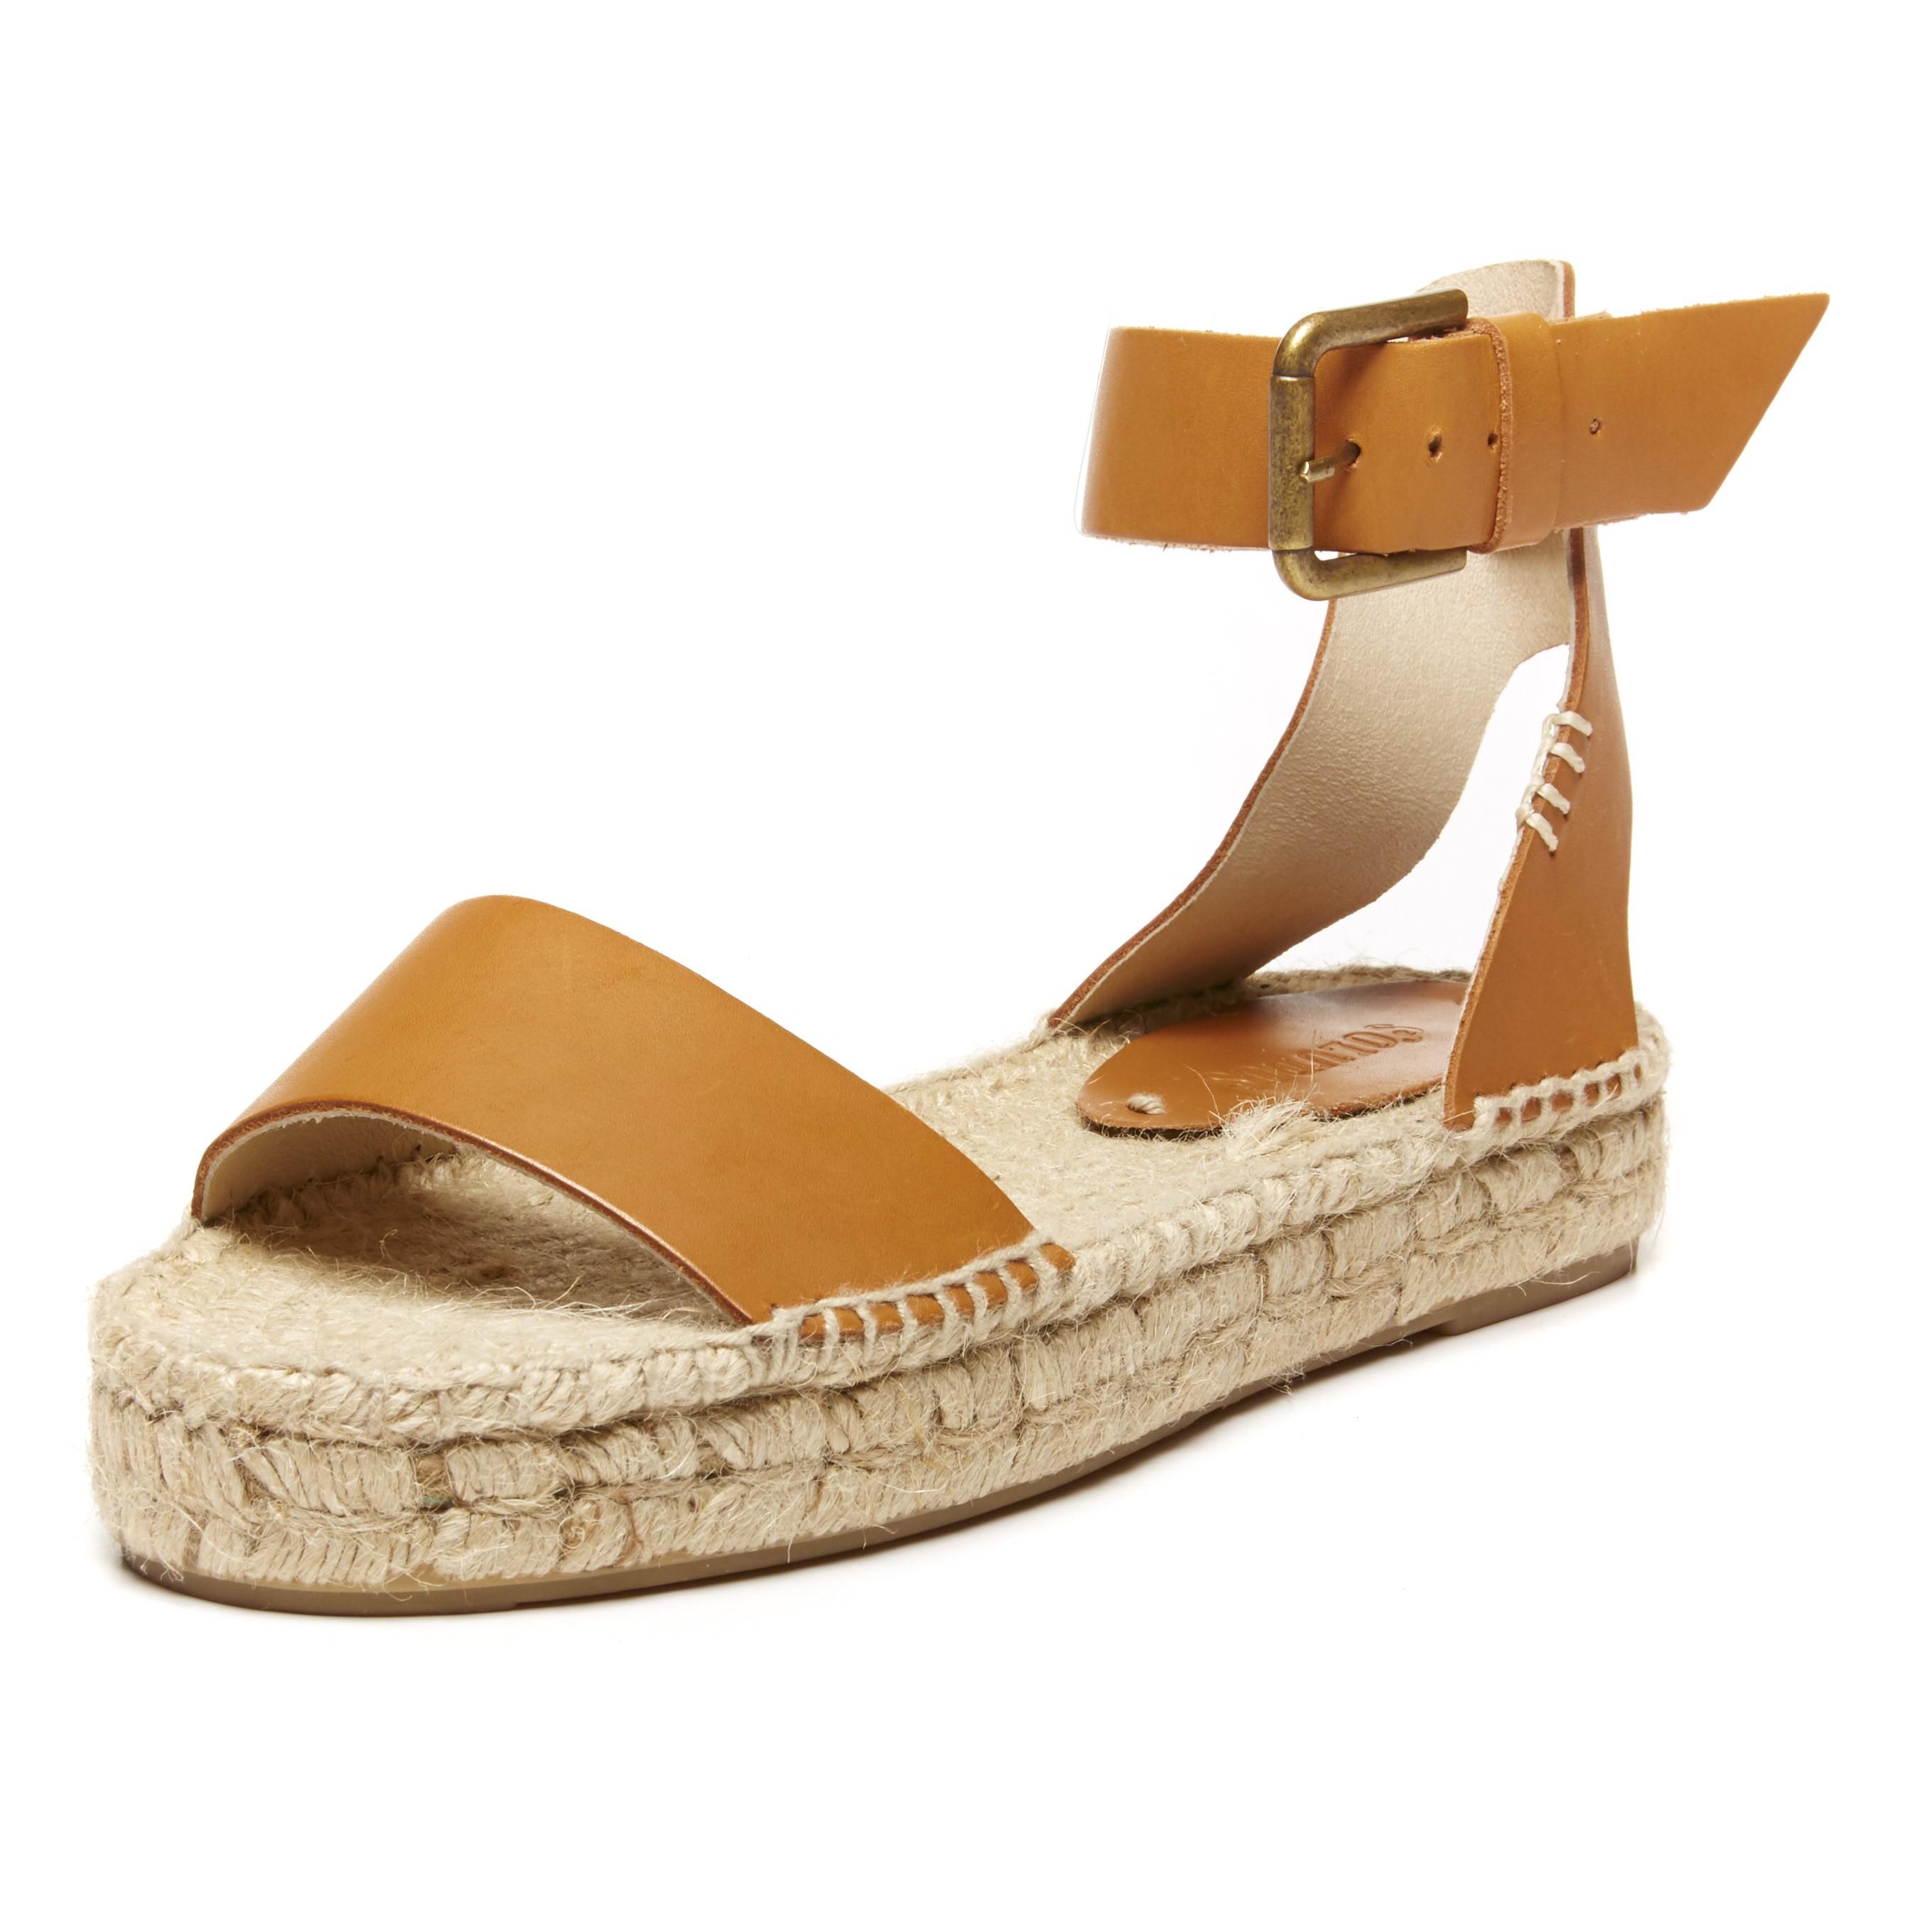 f769699d495d Soludos Tan Leather Open Toe Platform Sandal - Soludos Espadrilles